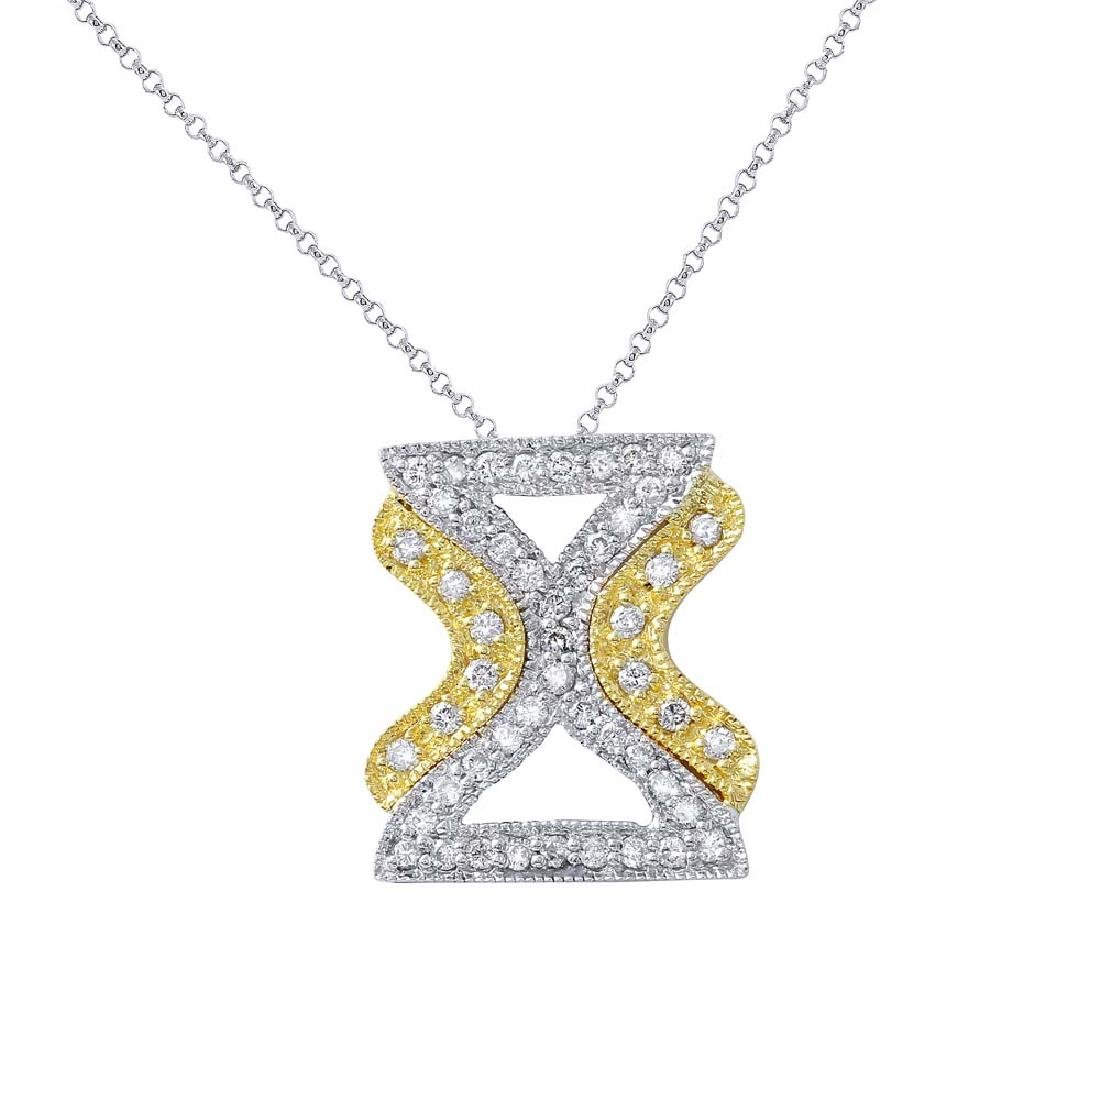 Genuine 0.5 TCW 18K Two Tone Gold Ladies Necklace